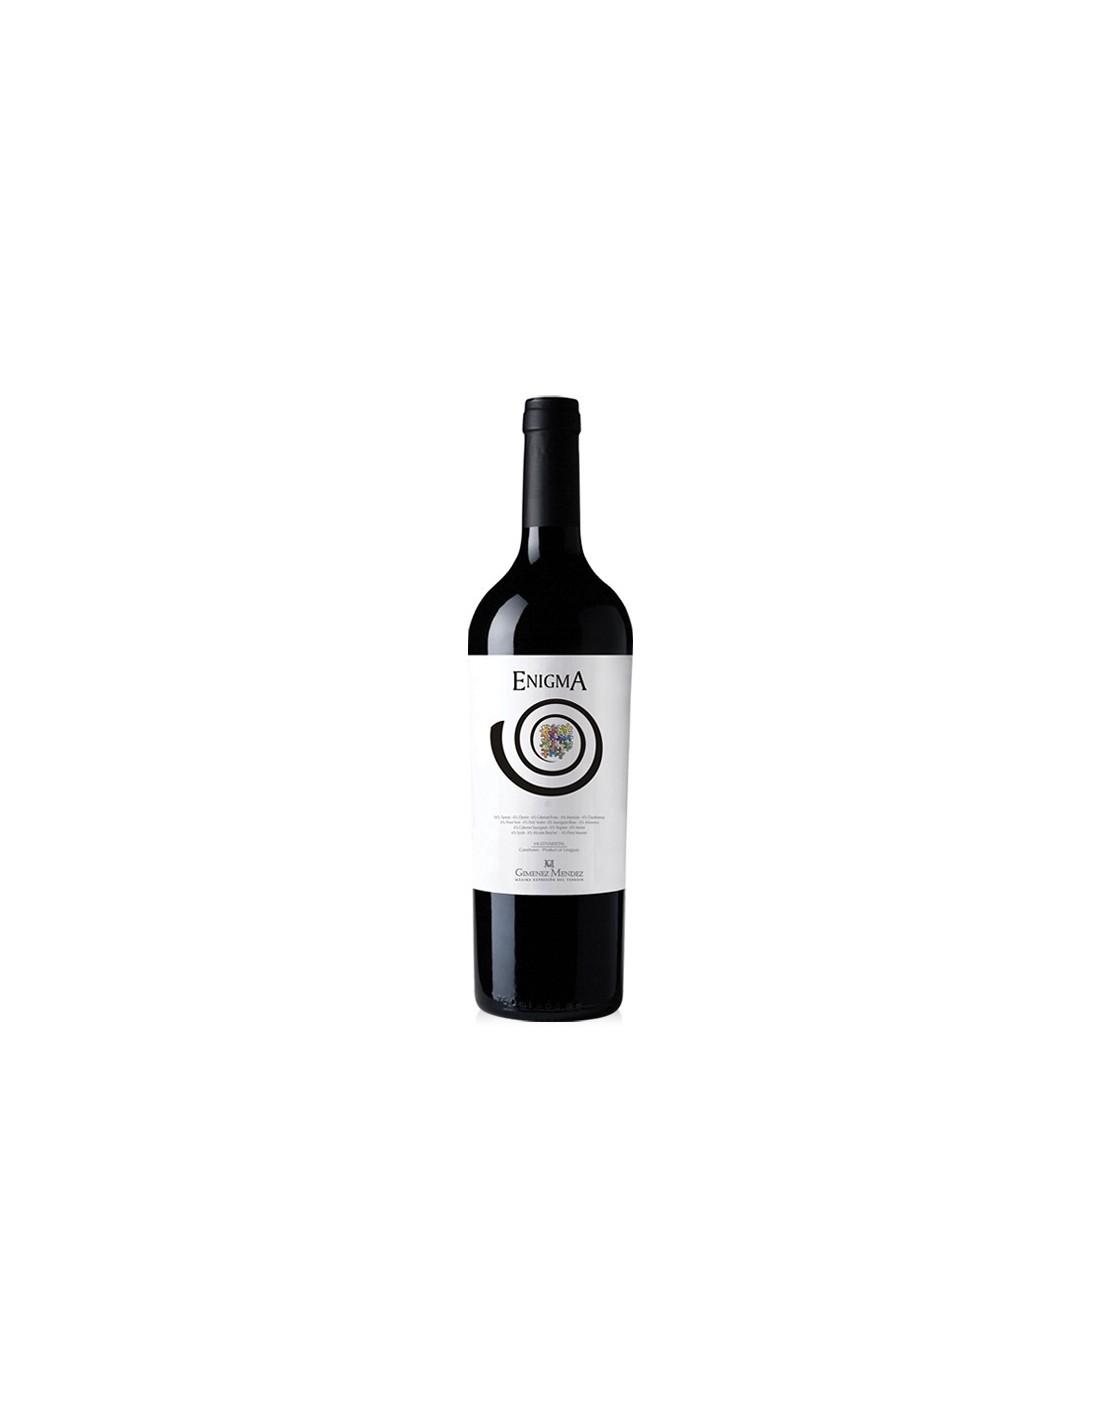 Vin rosu, Cupaj, Gimenez Mendez Enigma Multivarietal, 0.75L, 14.2% alc., Uruguay